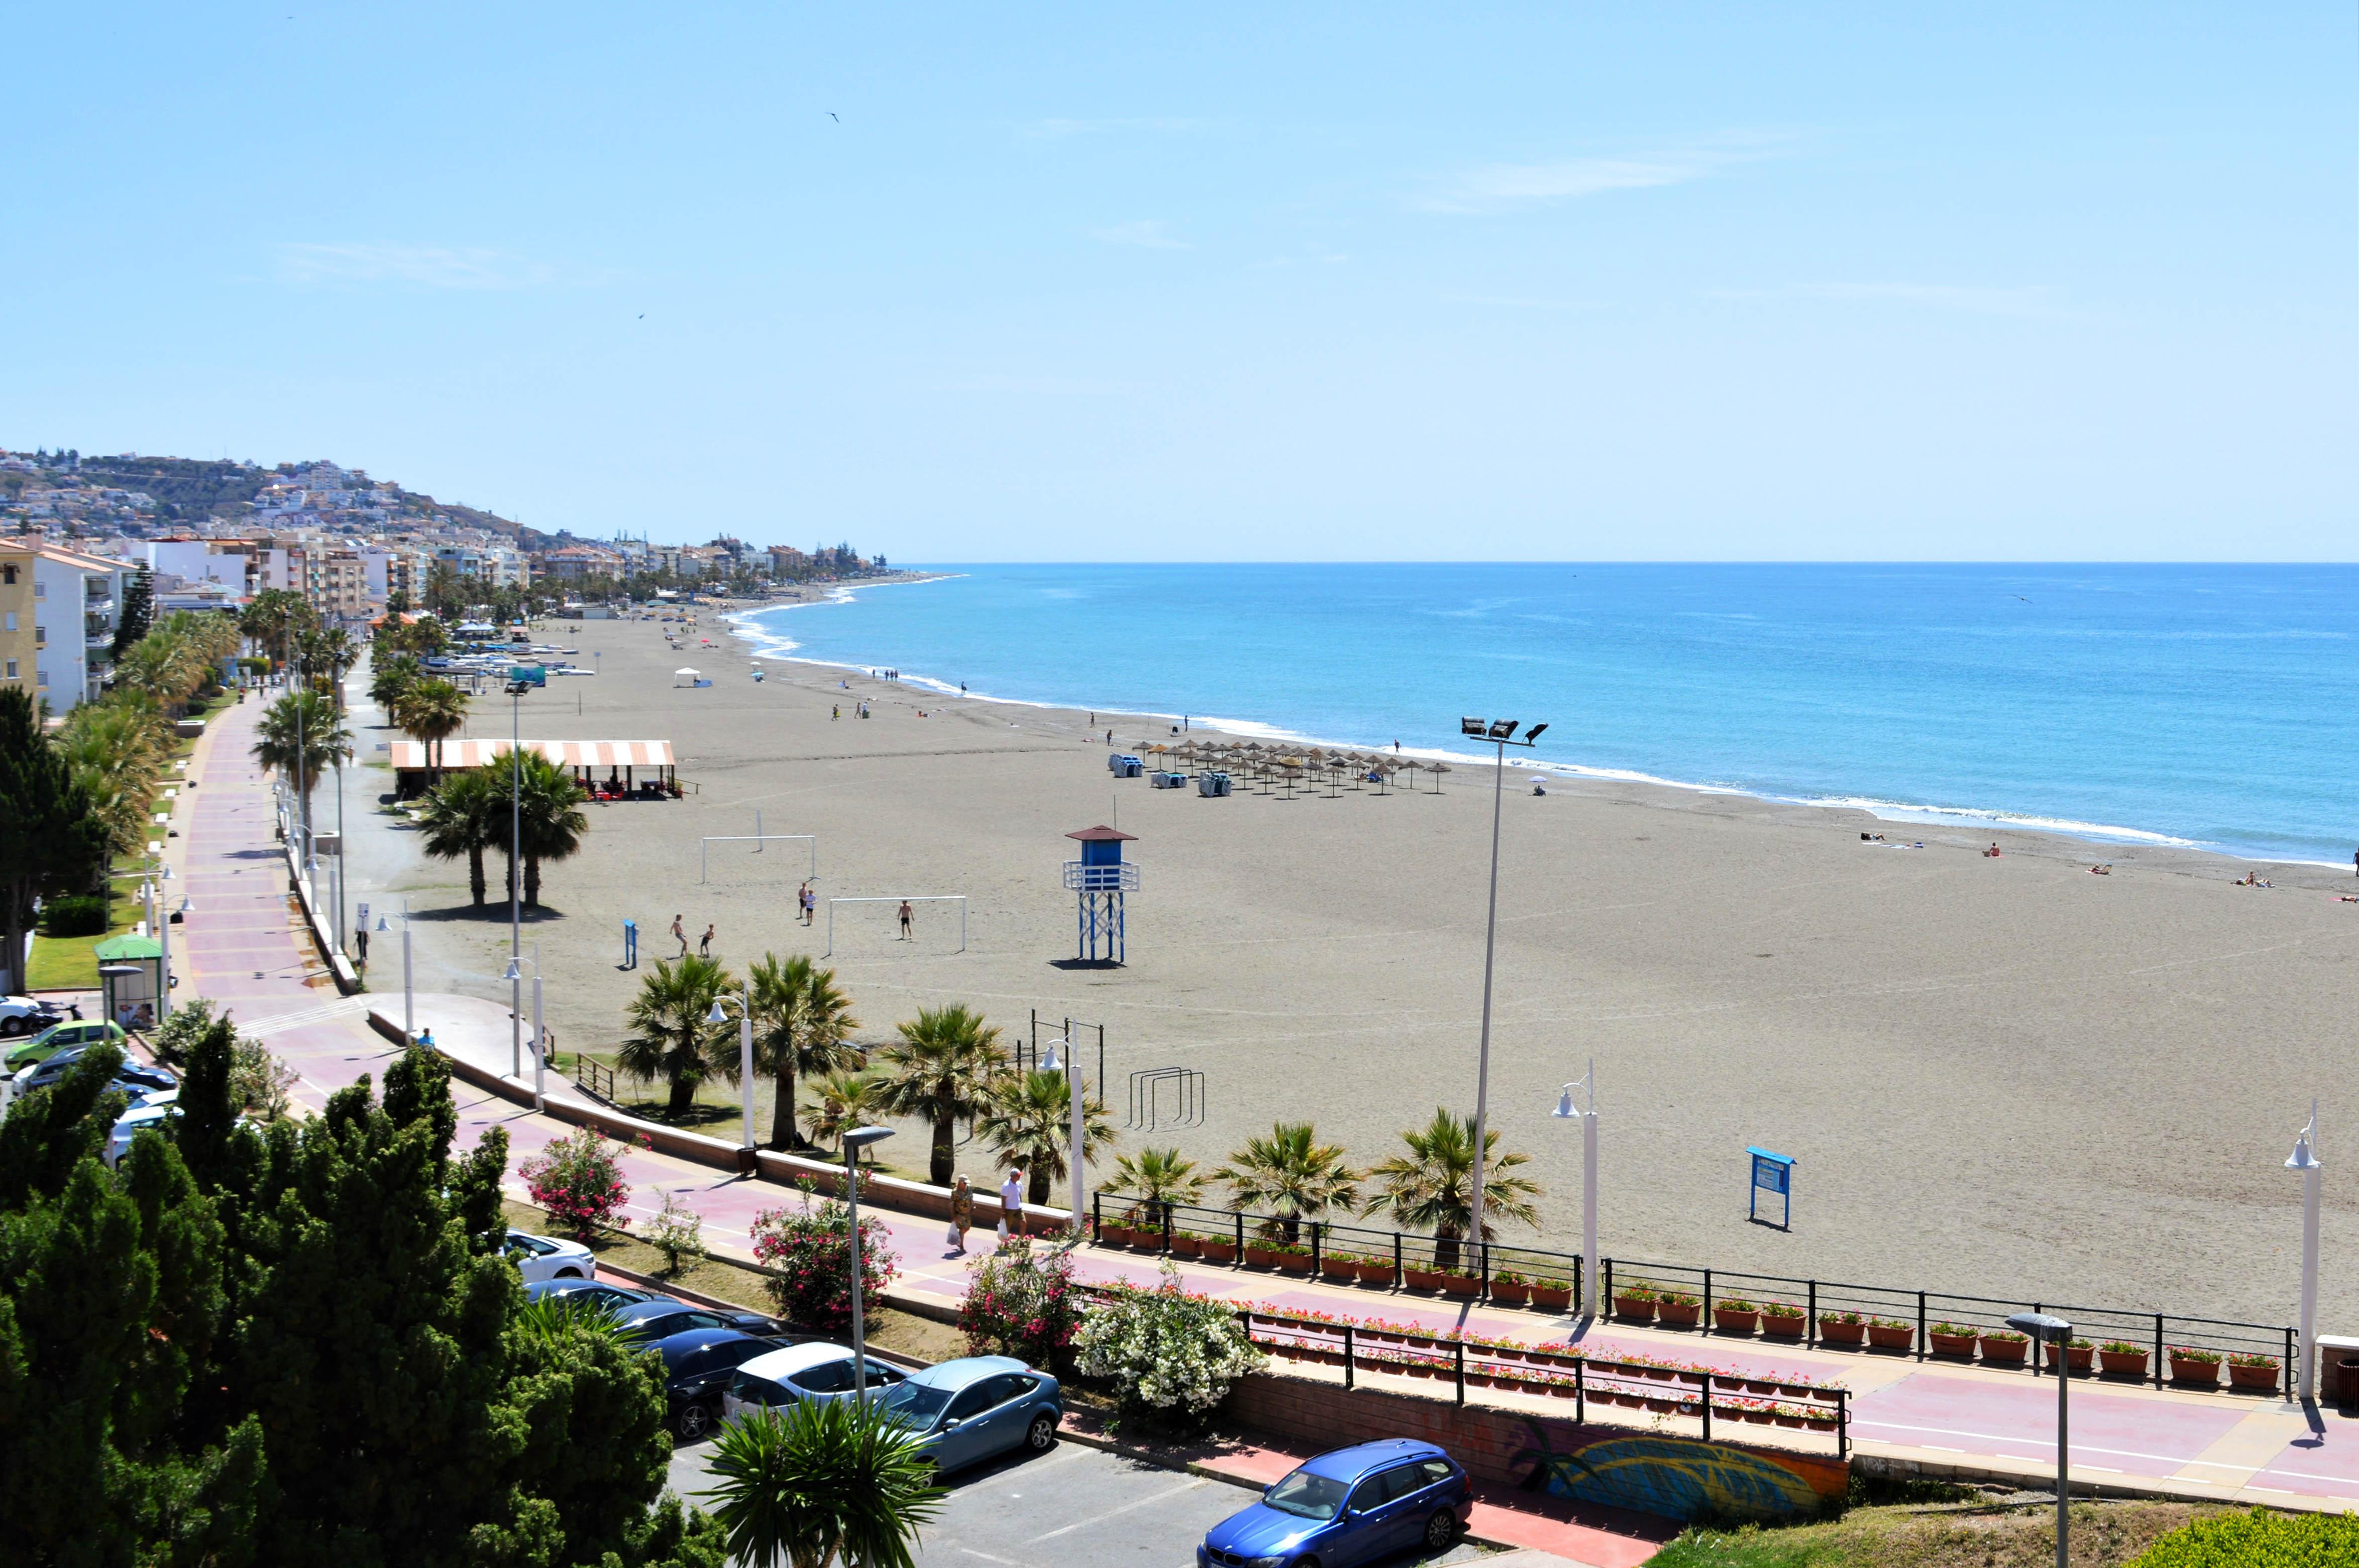 Playa Rincon De La Victoria Diario Axarquia Malaga